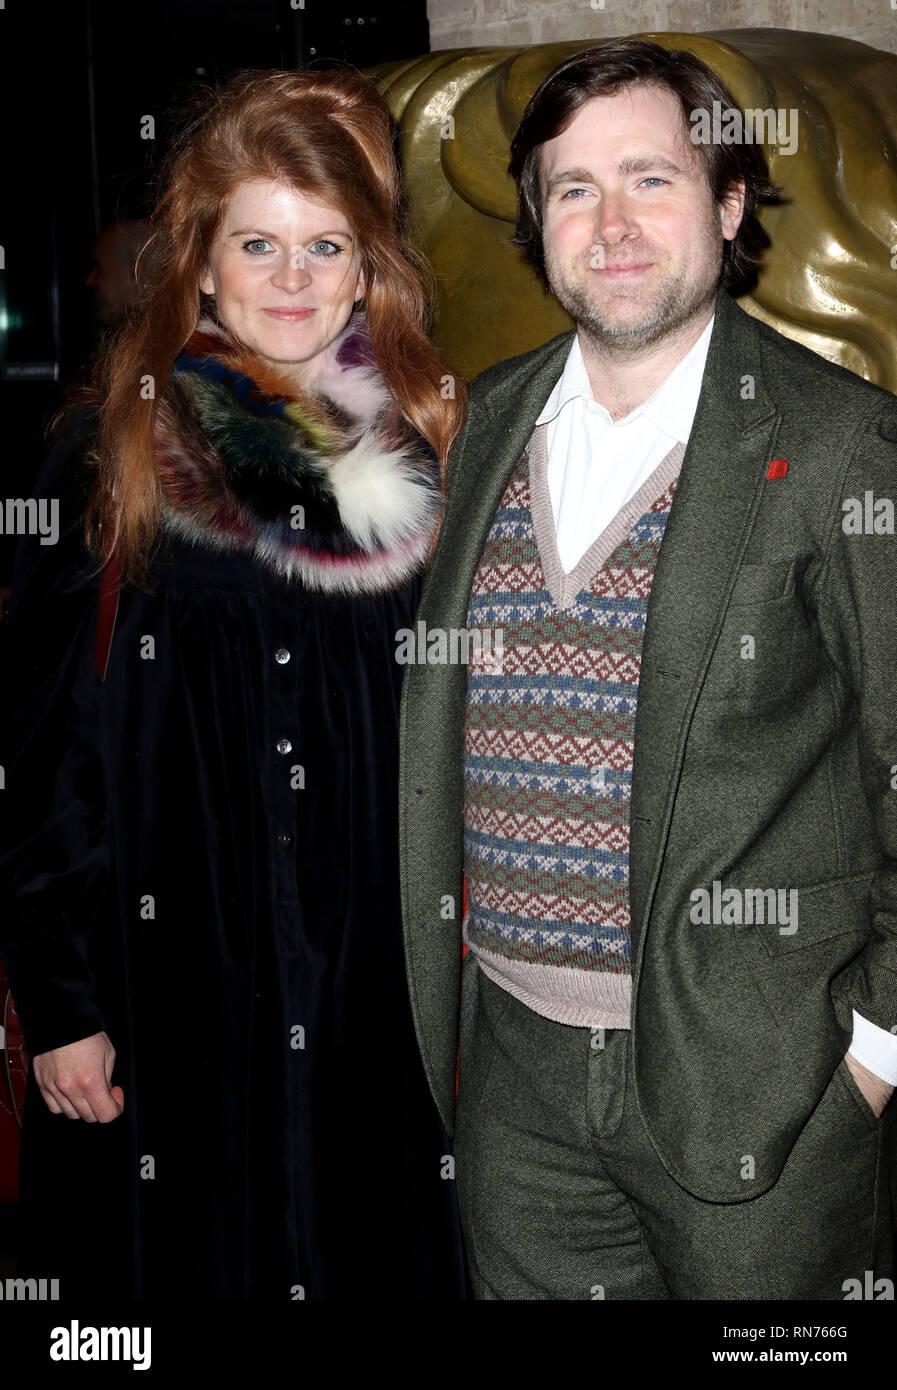 Nov 22, 2015 - London, England, UK - British Academy's Kinder Awards, The Roundhouse, Camden Foto zeigt: Paul König Stockfoto